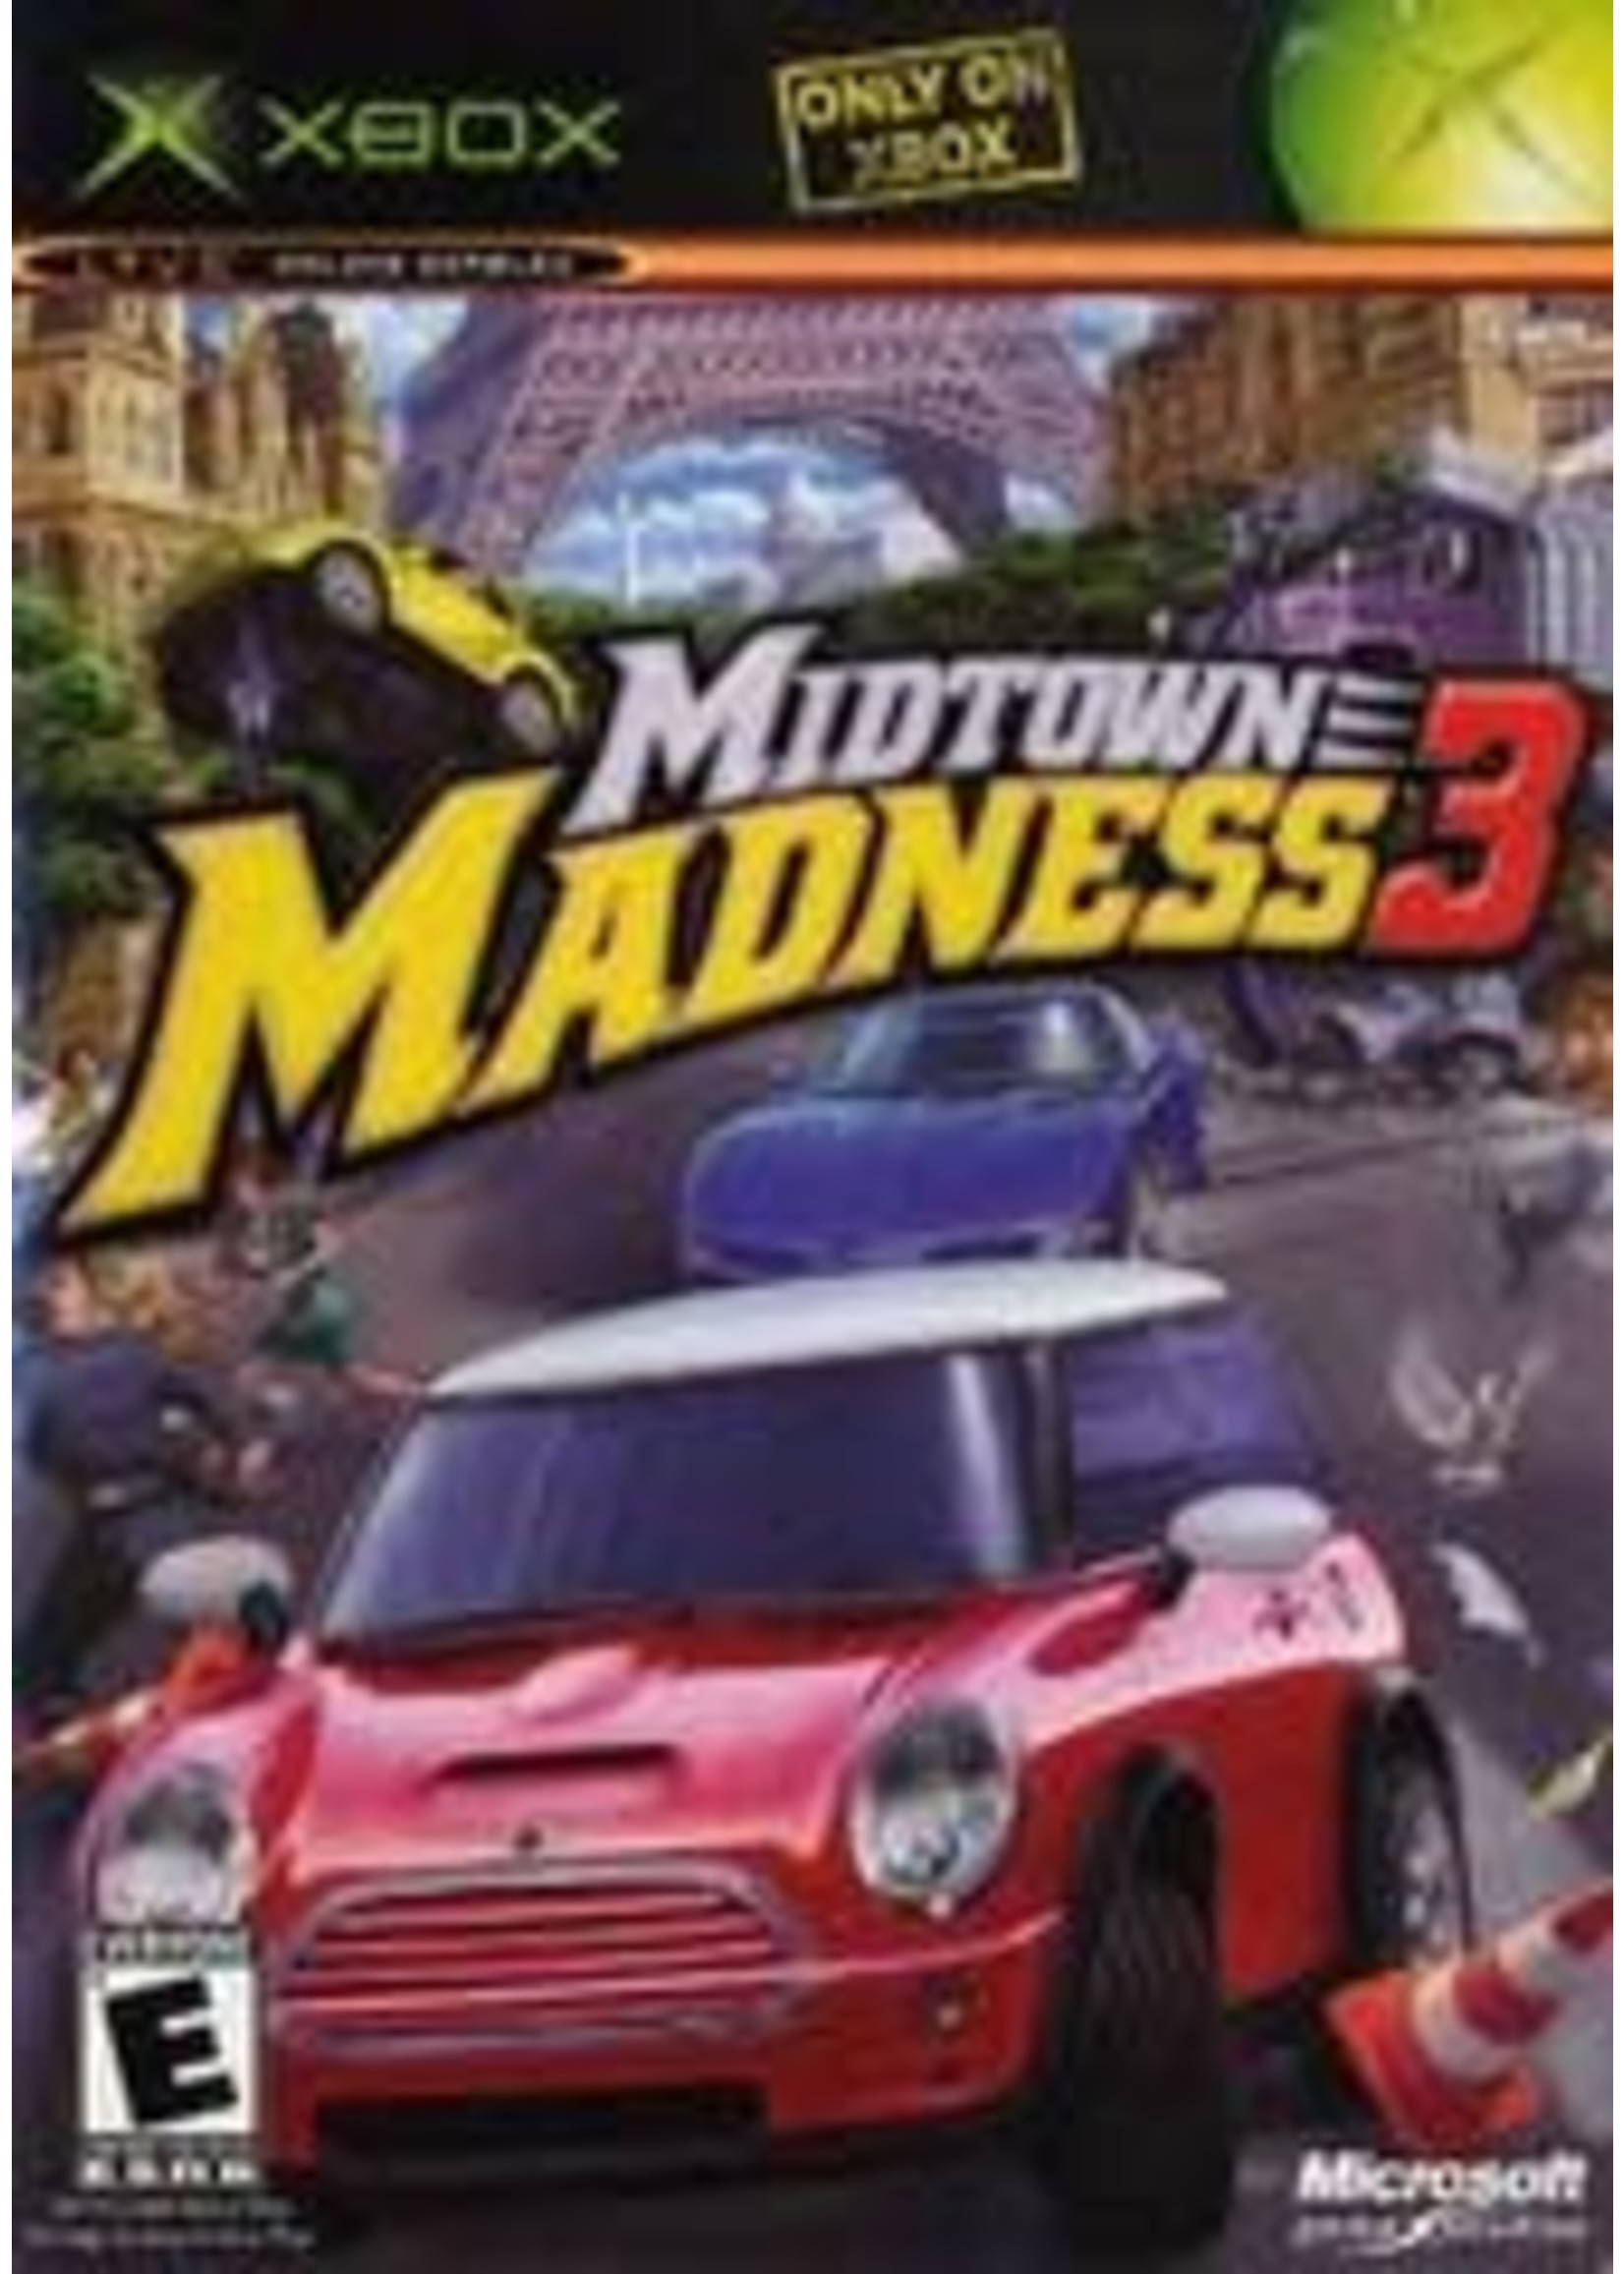 Midtown Madness 3 Xbox